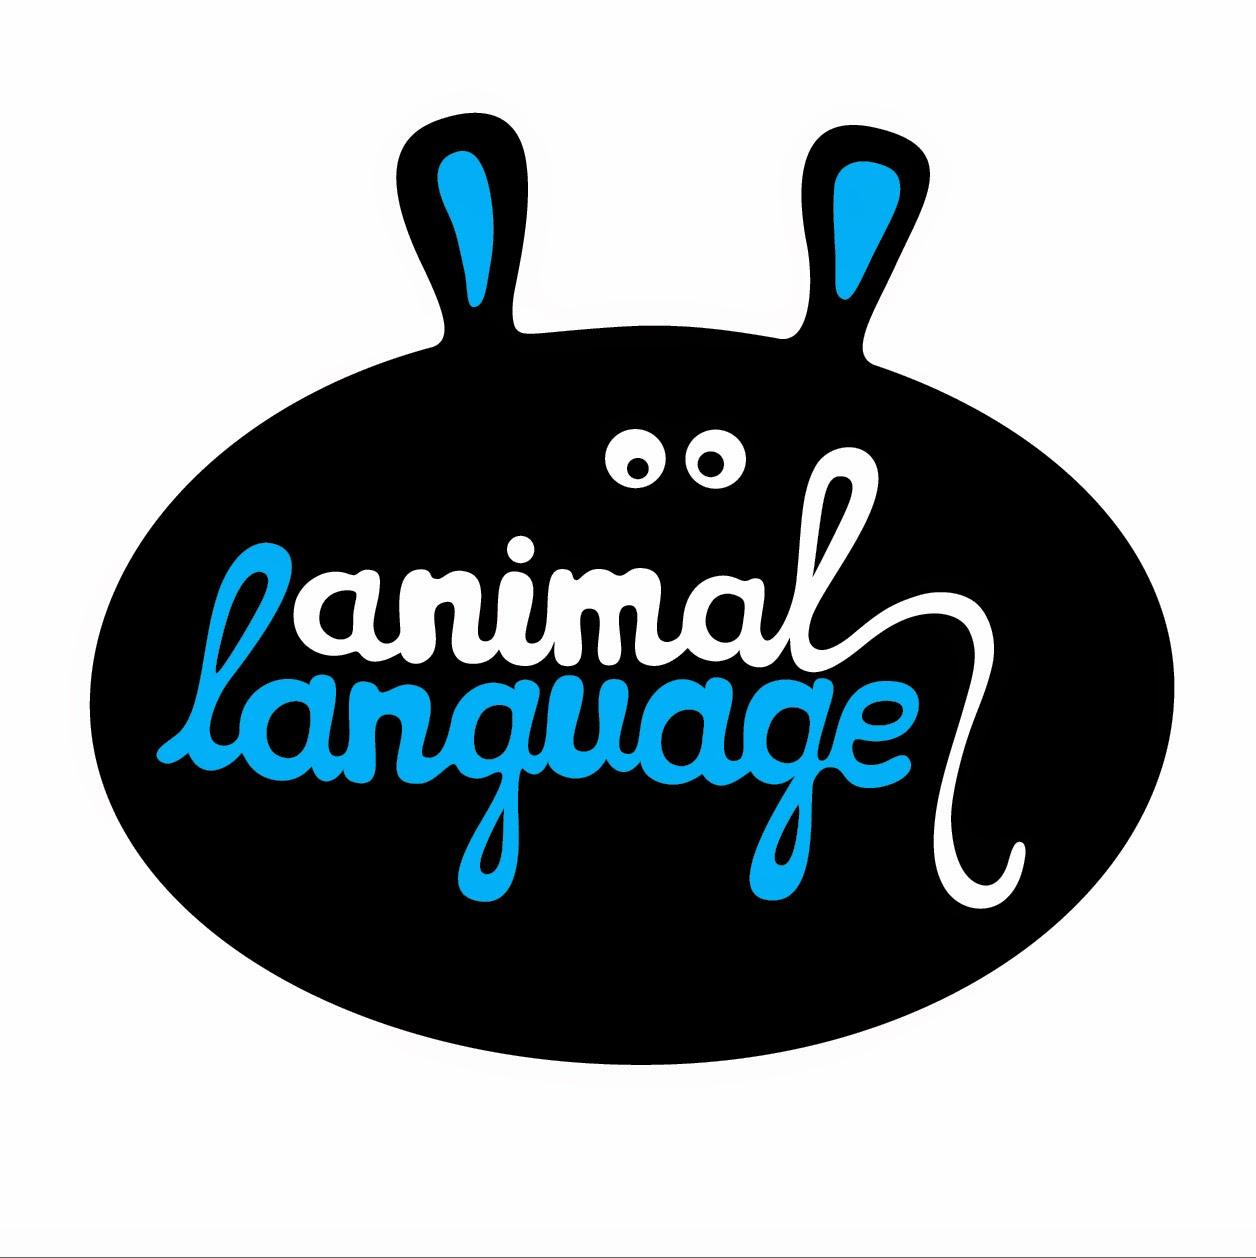 animal language mason redbull remix competition